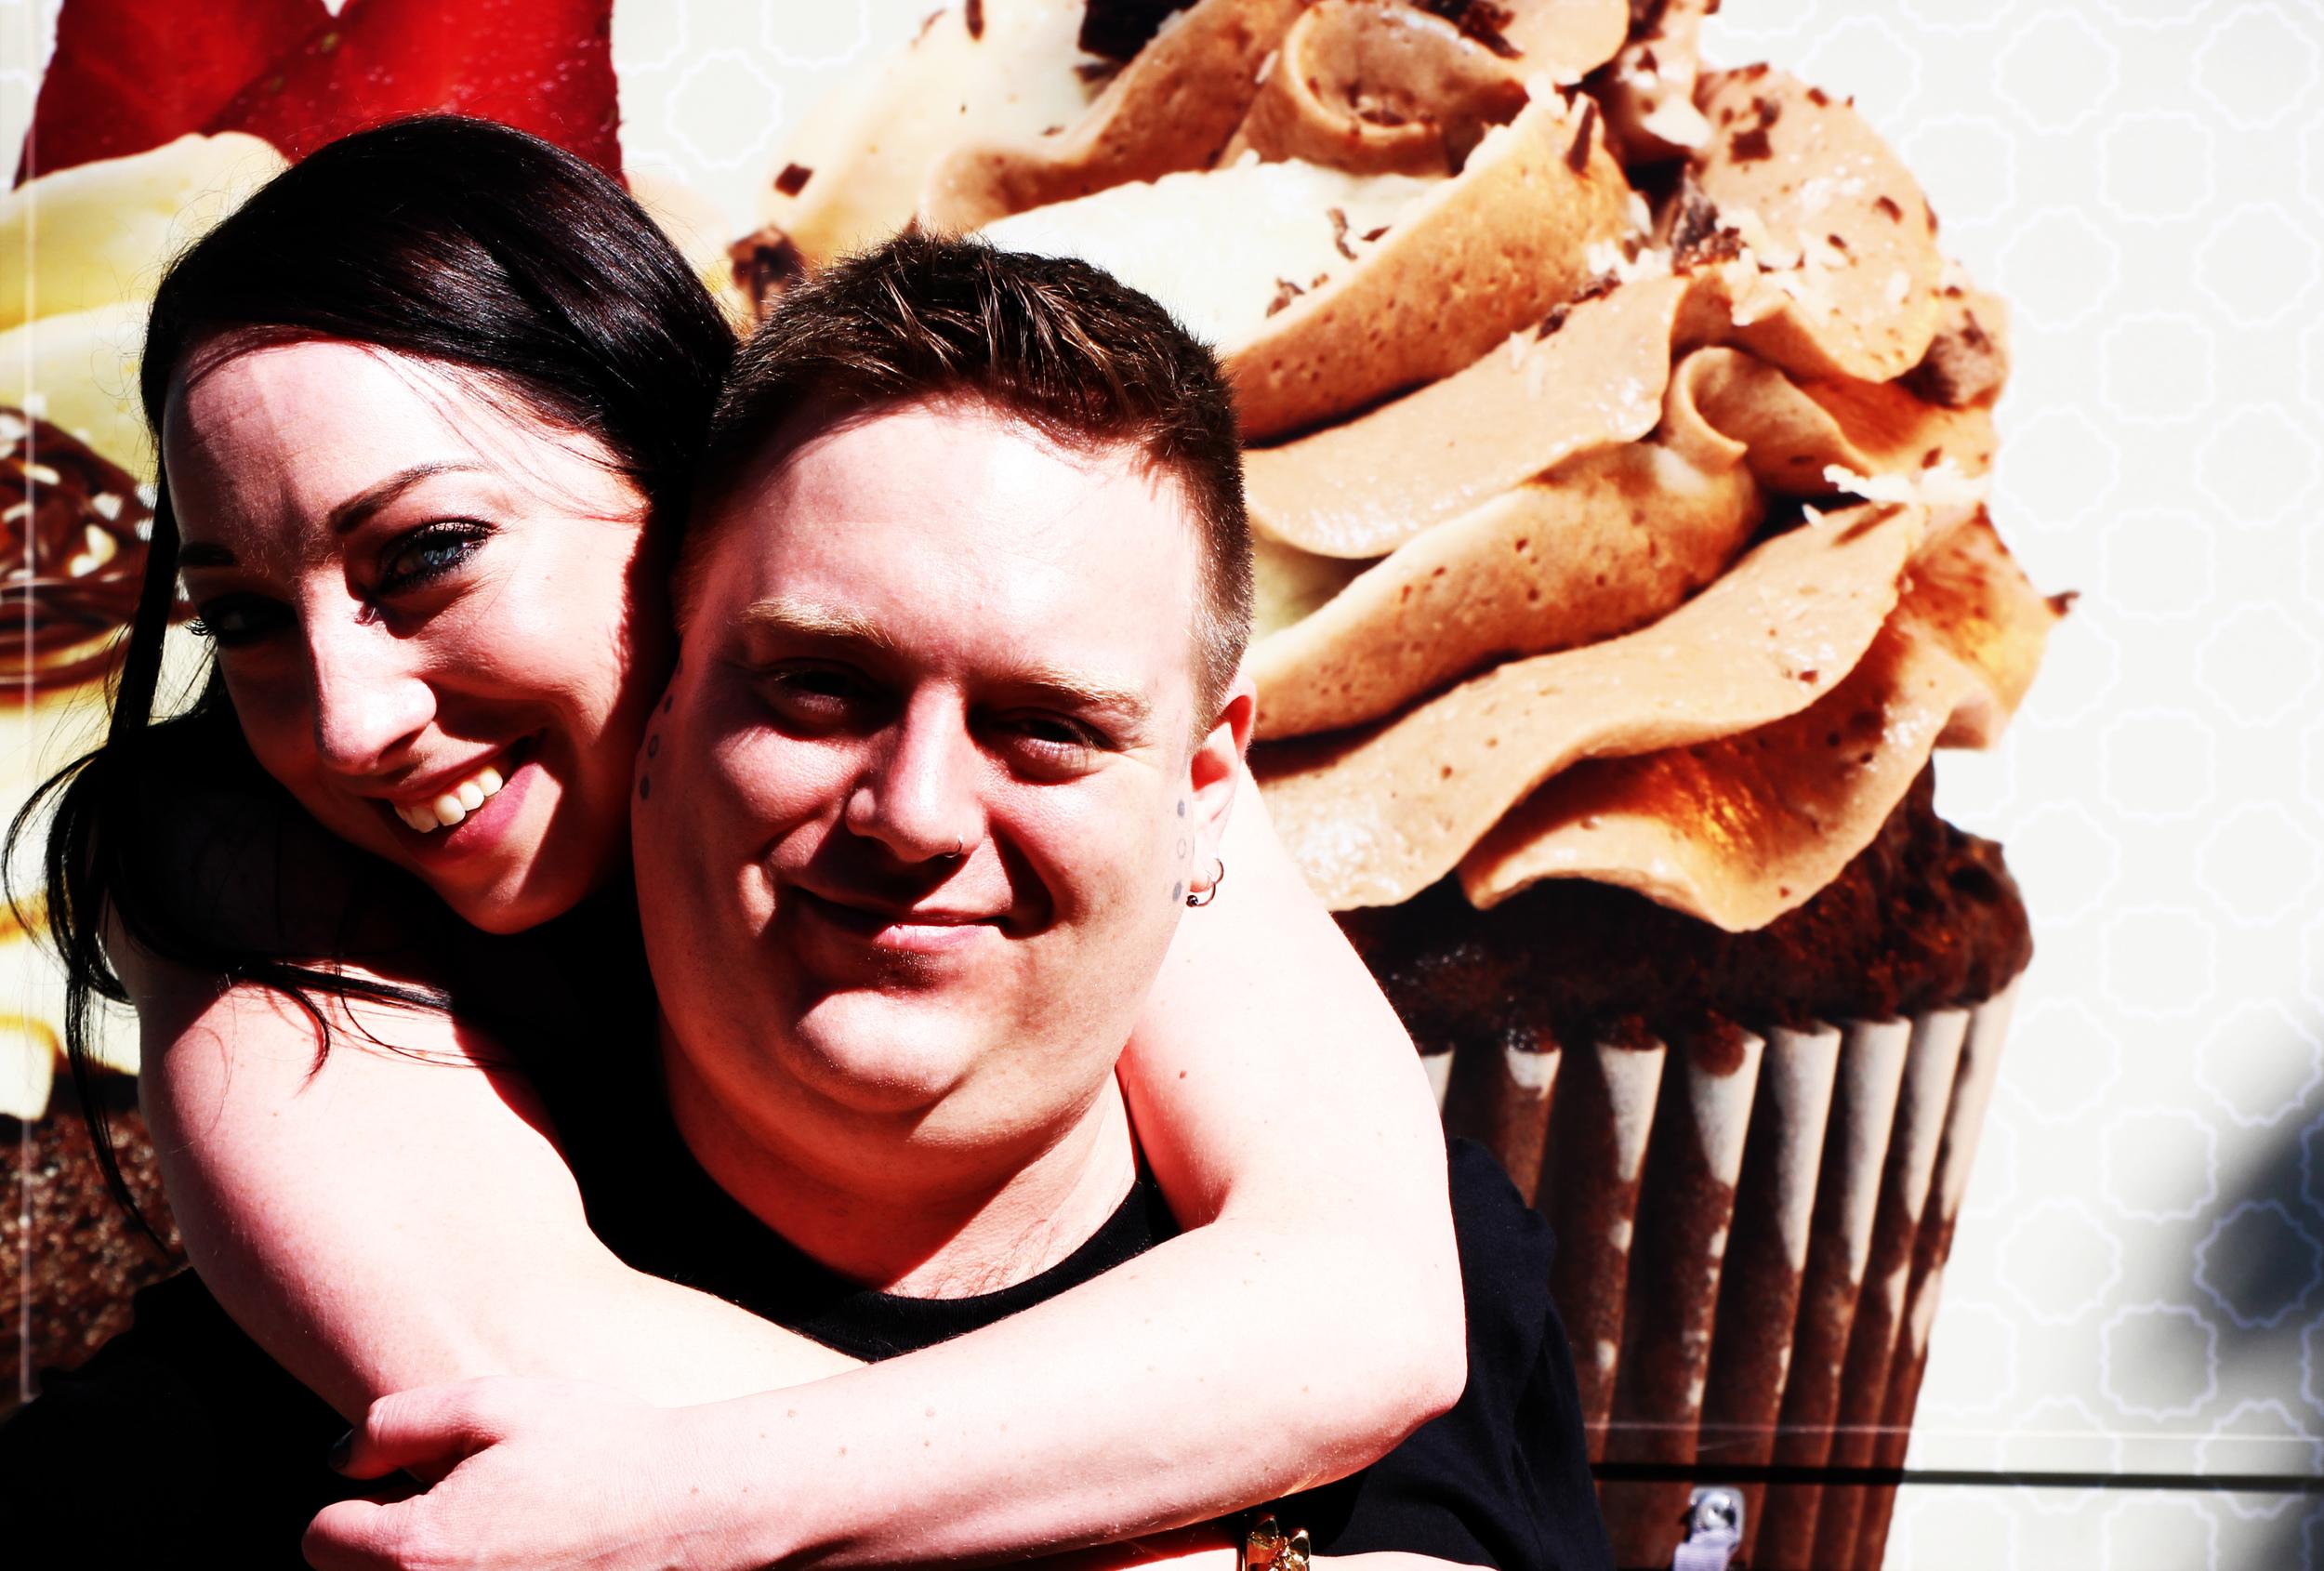 nathan and leah cupcake truck.jpg